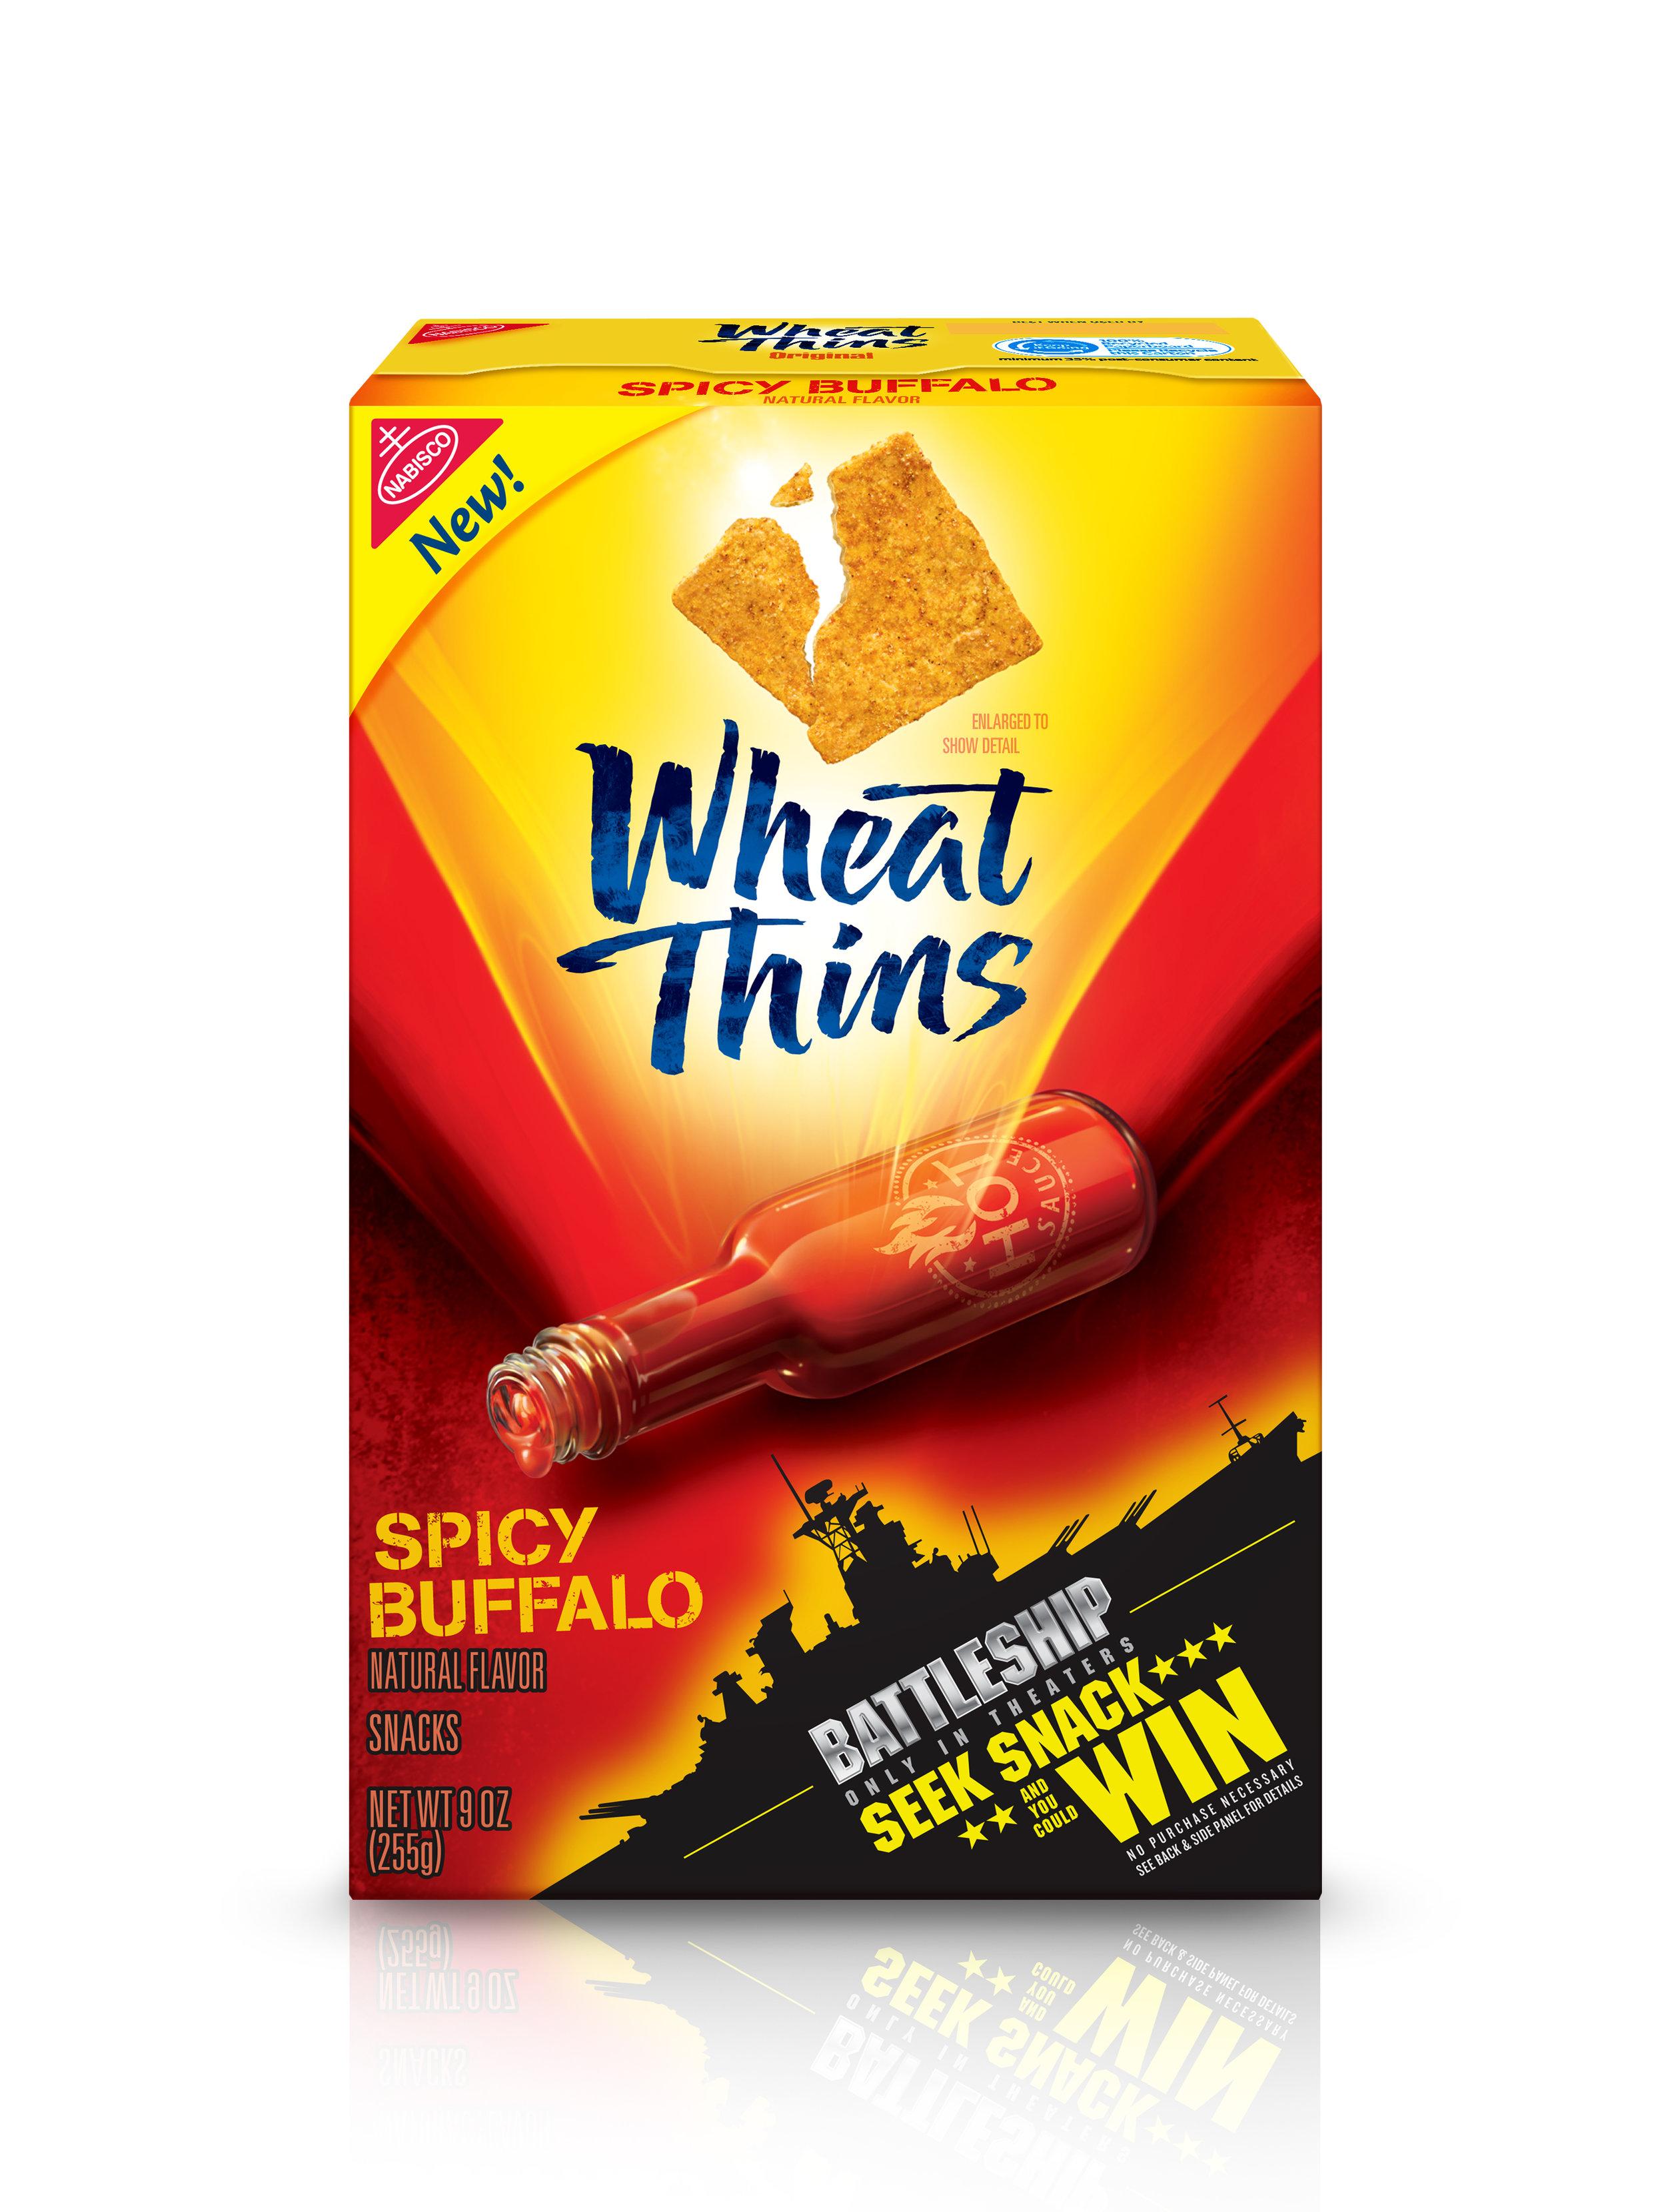 Battleship_Wheat_Thins_SpicyBaffalo.jpg